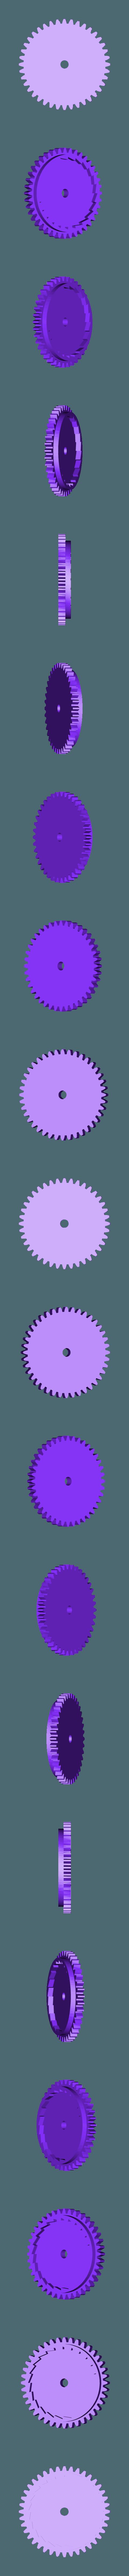 Gear_Spring.stl Download free STL file Windup Bunny • 3D printing design, gzumwalt